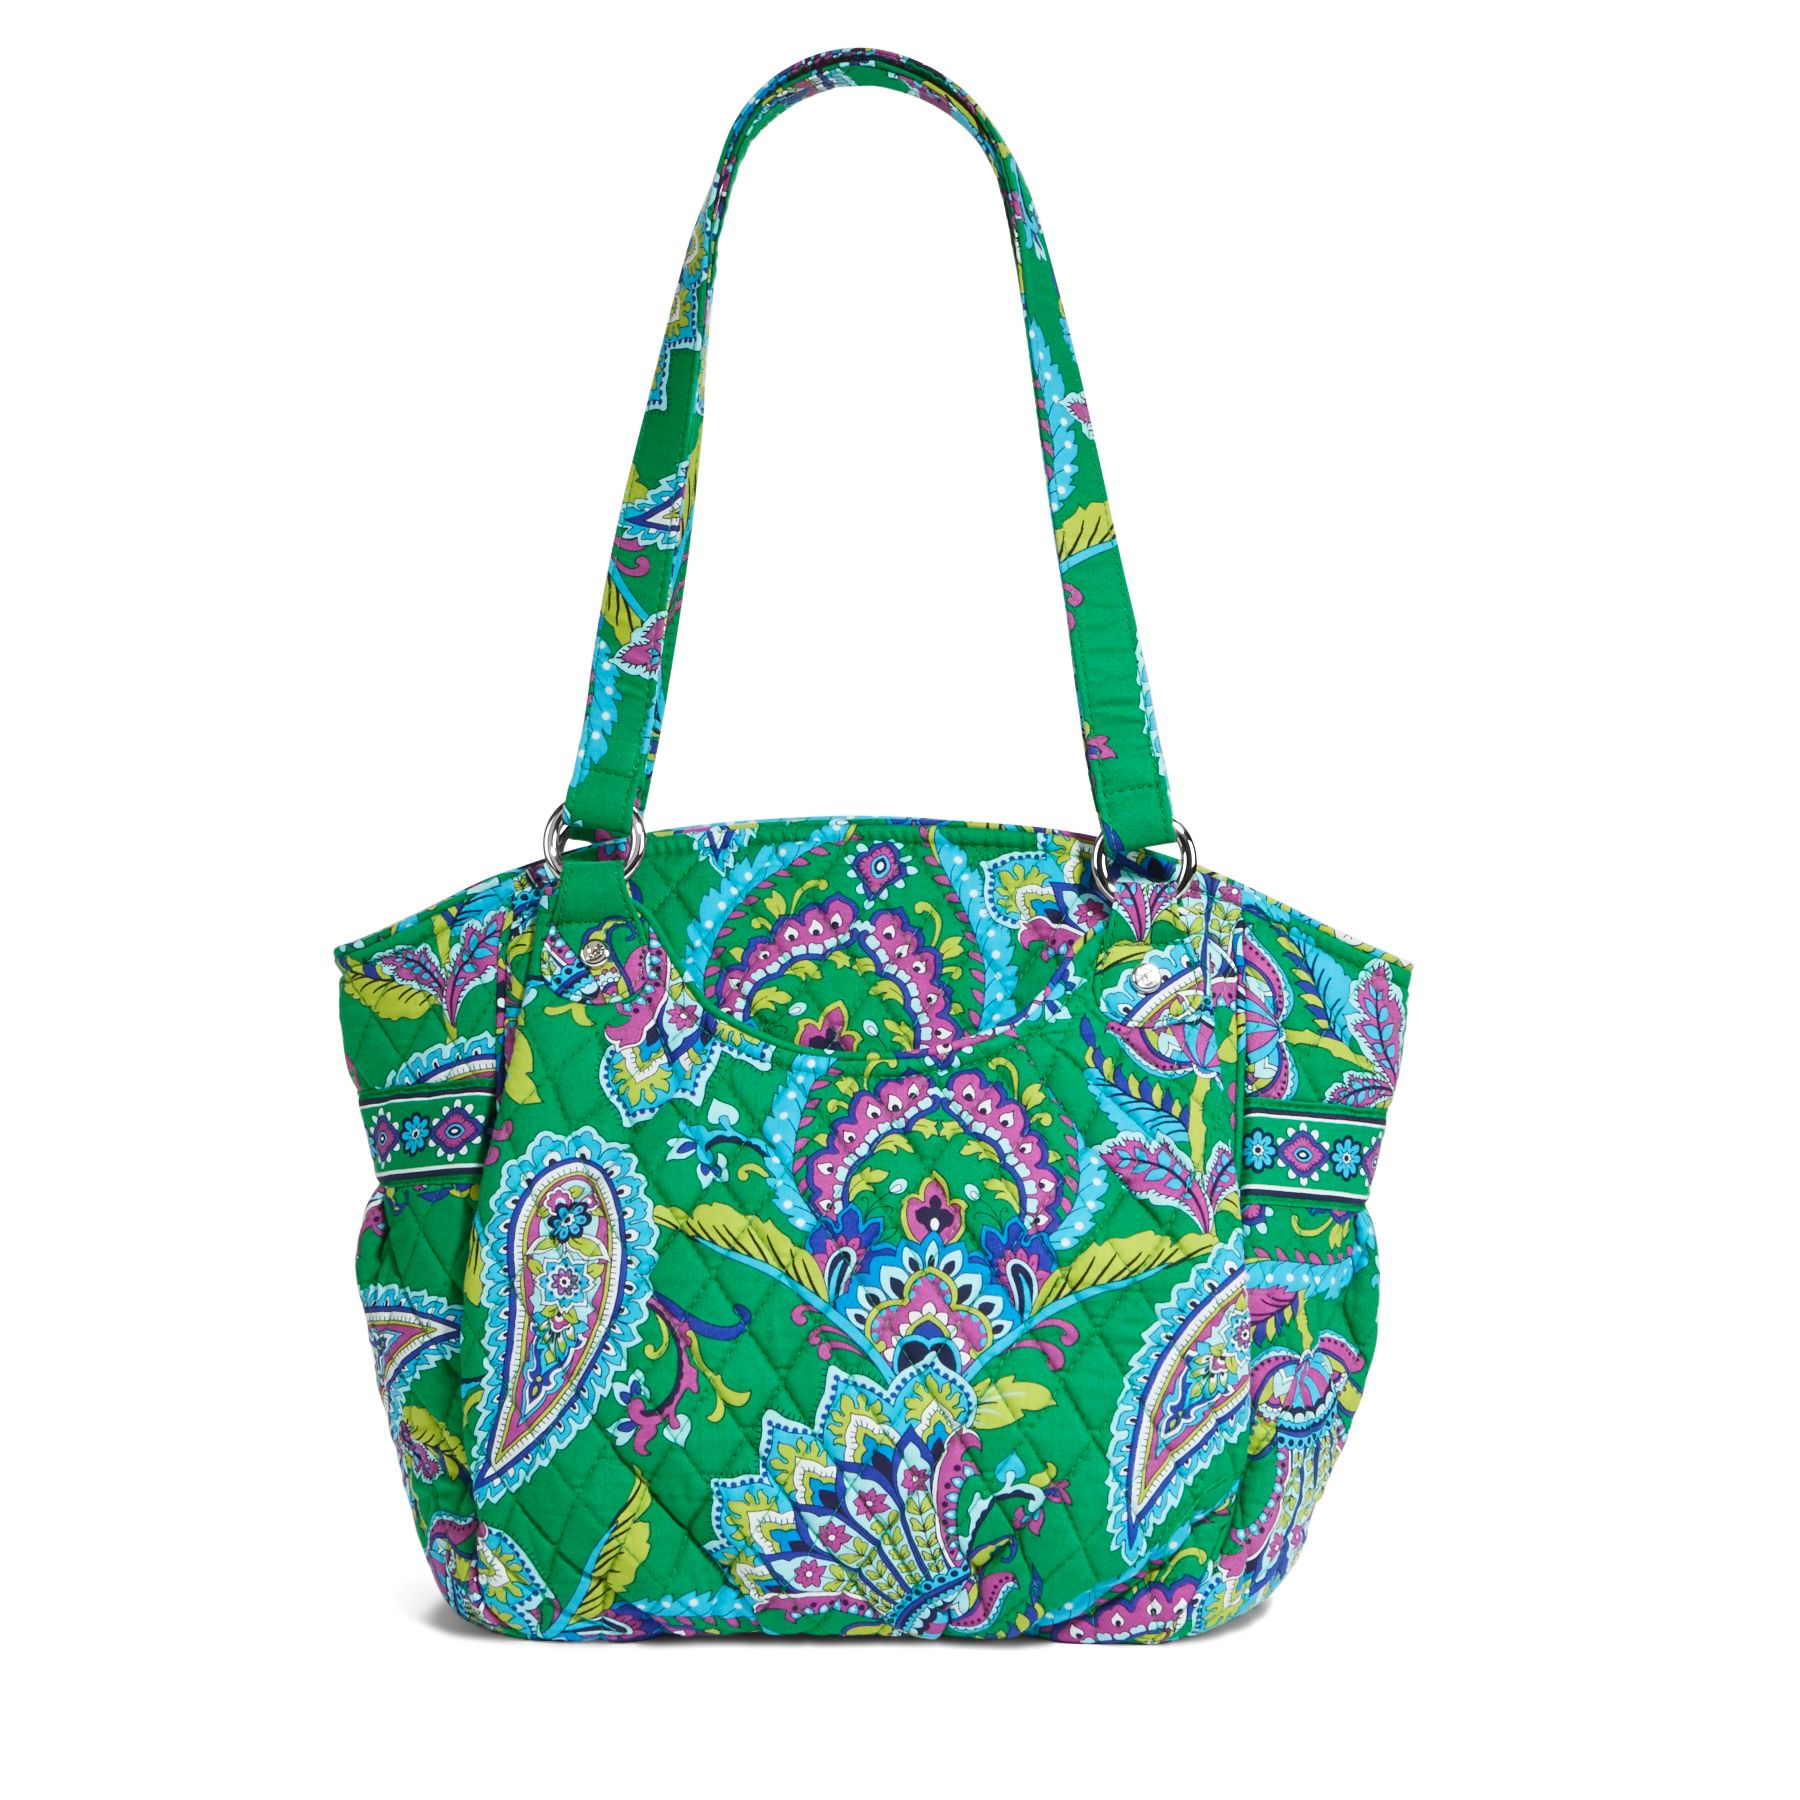 Vera Bradley Glenna Shoulder Bag in Emerald Paisley